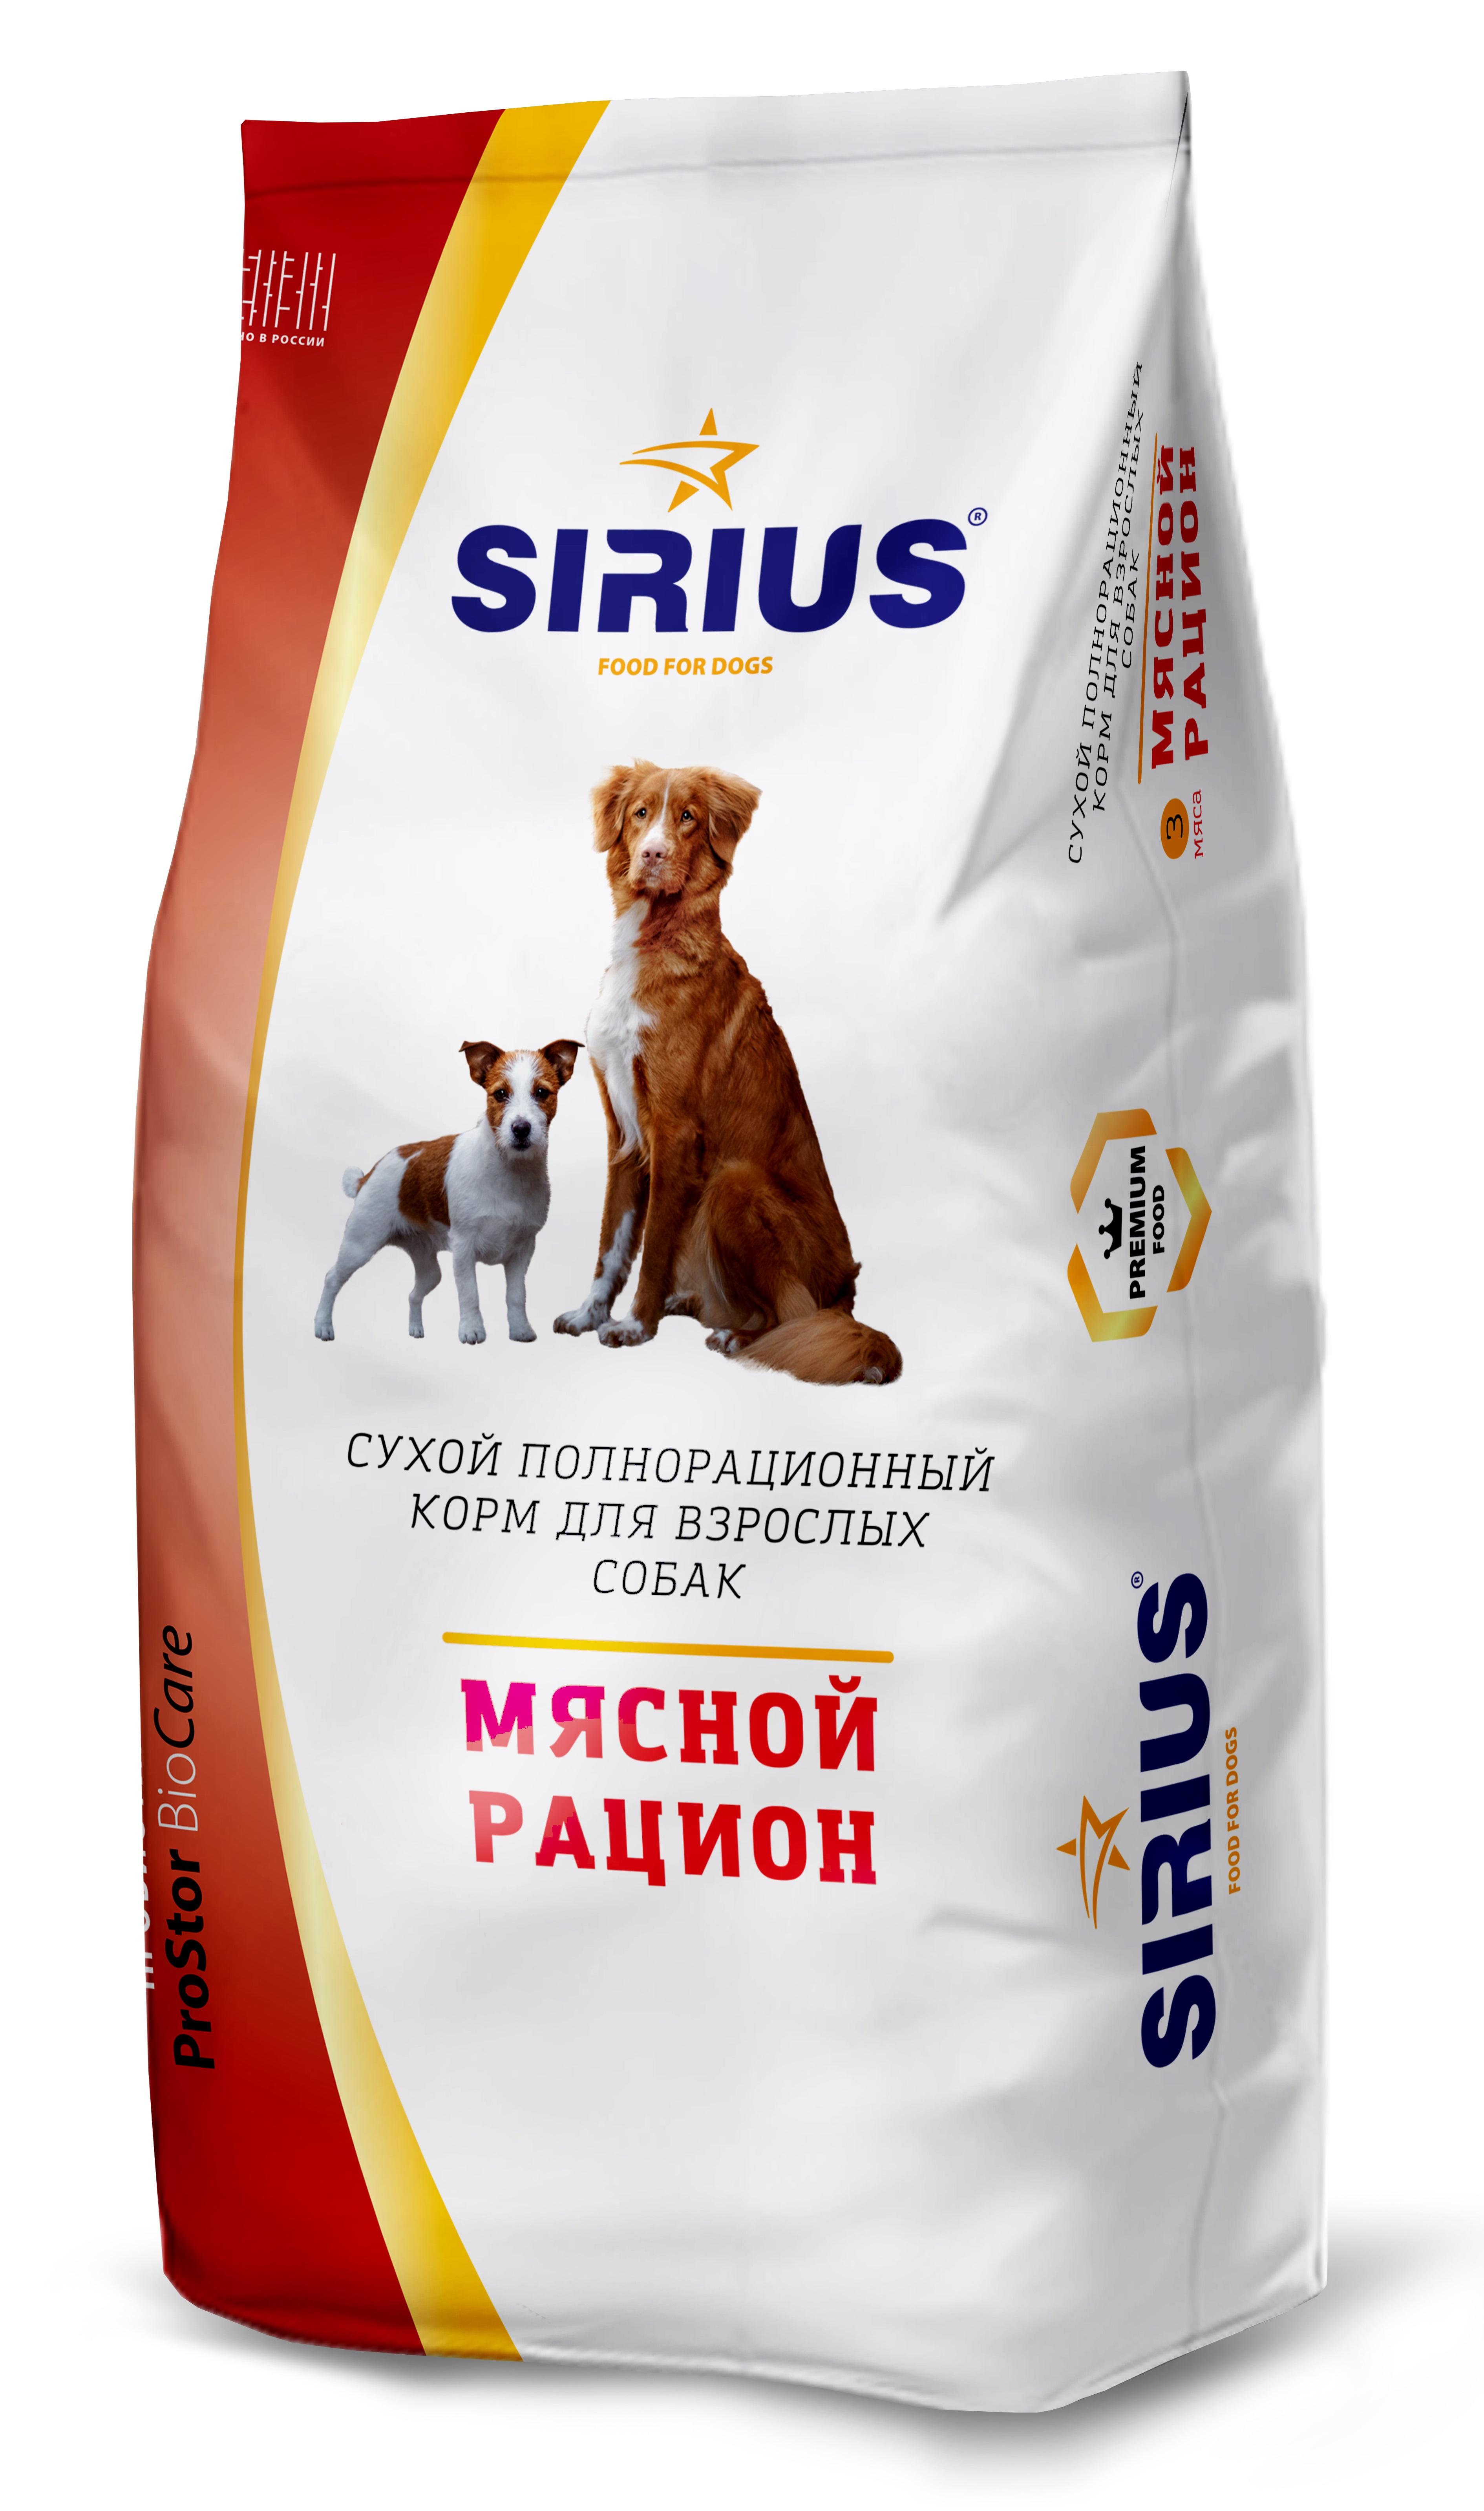 Сухой корм для взрослых собак SIRIUS, 3 кг